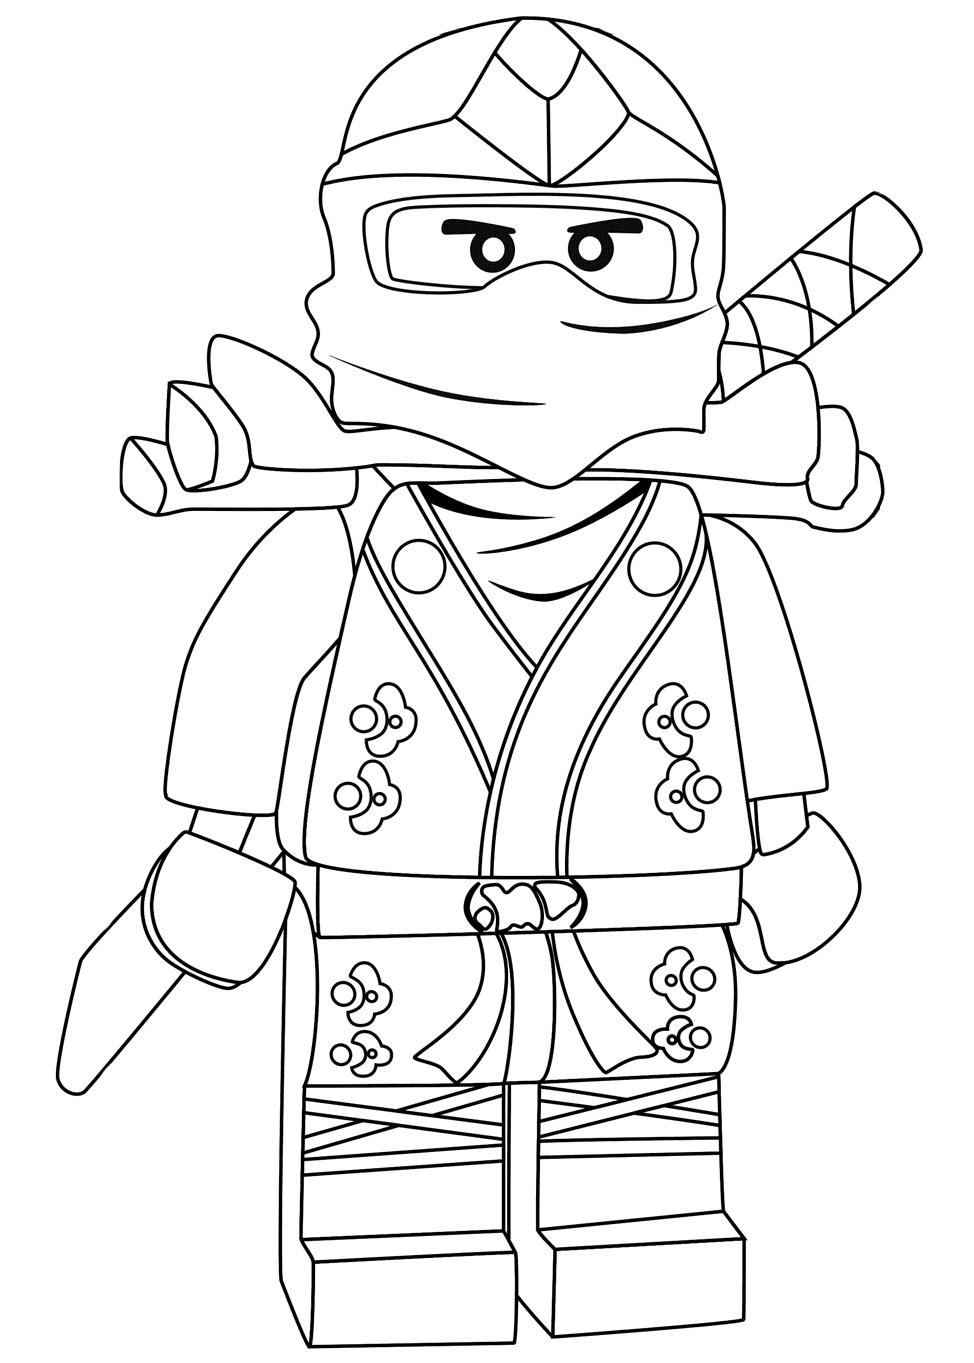 Lego Ninjago Grüner Ninja Ausmalbilder : Nett Lego Ninjago Malvorlagen Lloyd Bilder Malvorlagen Von Tieren